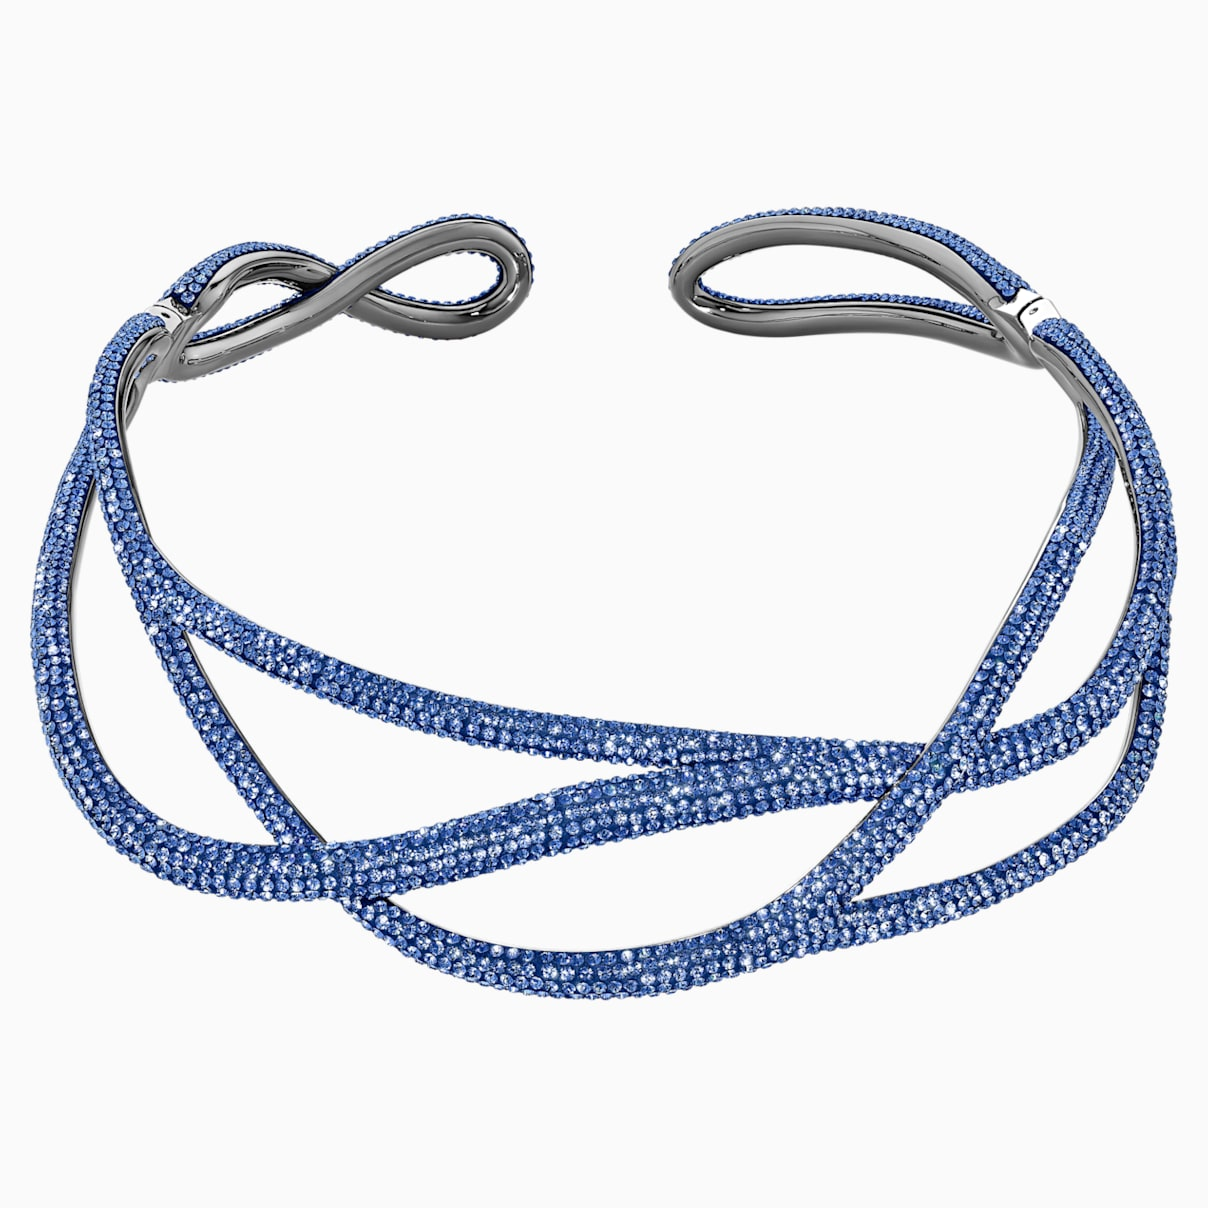 Ras-de-cou Tigris Statement, bleu, métal plaqué ruthénium